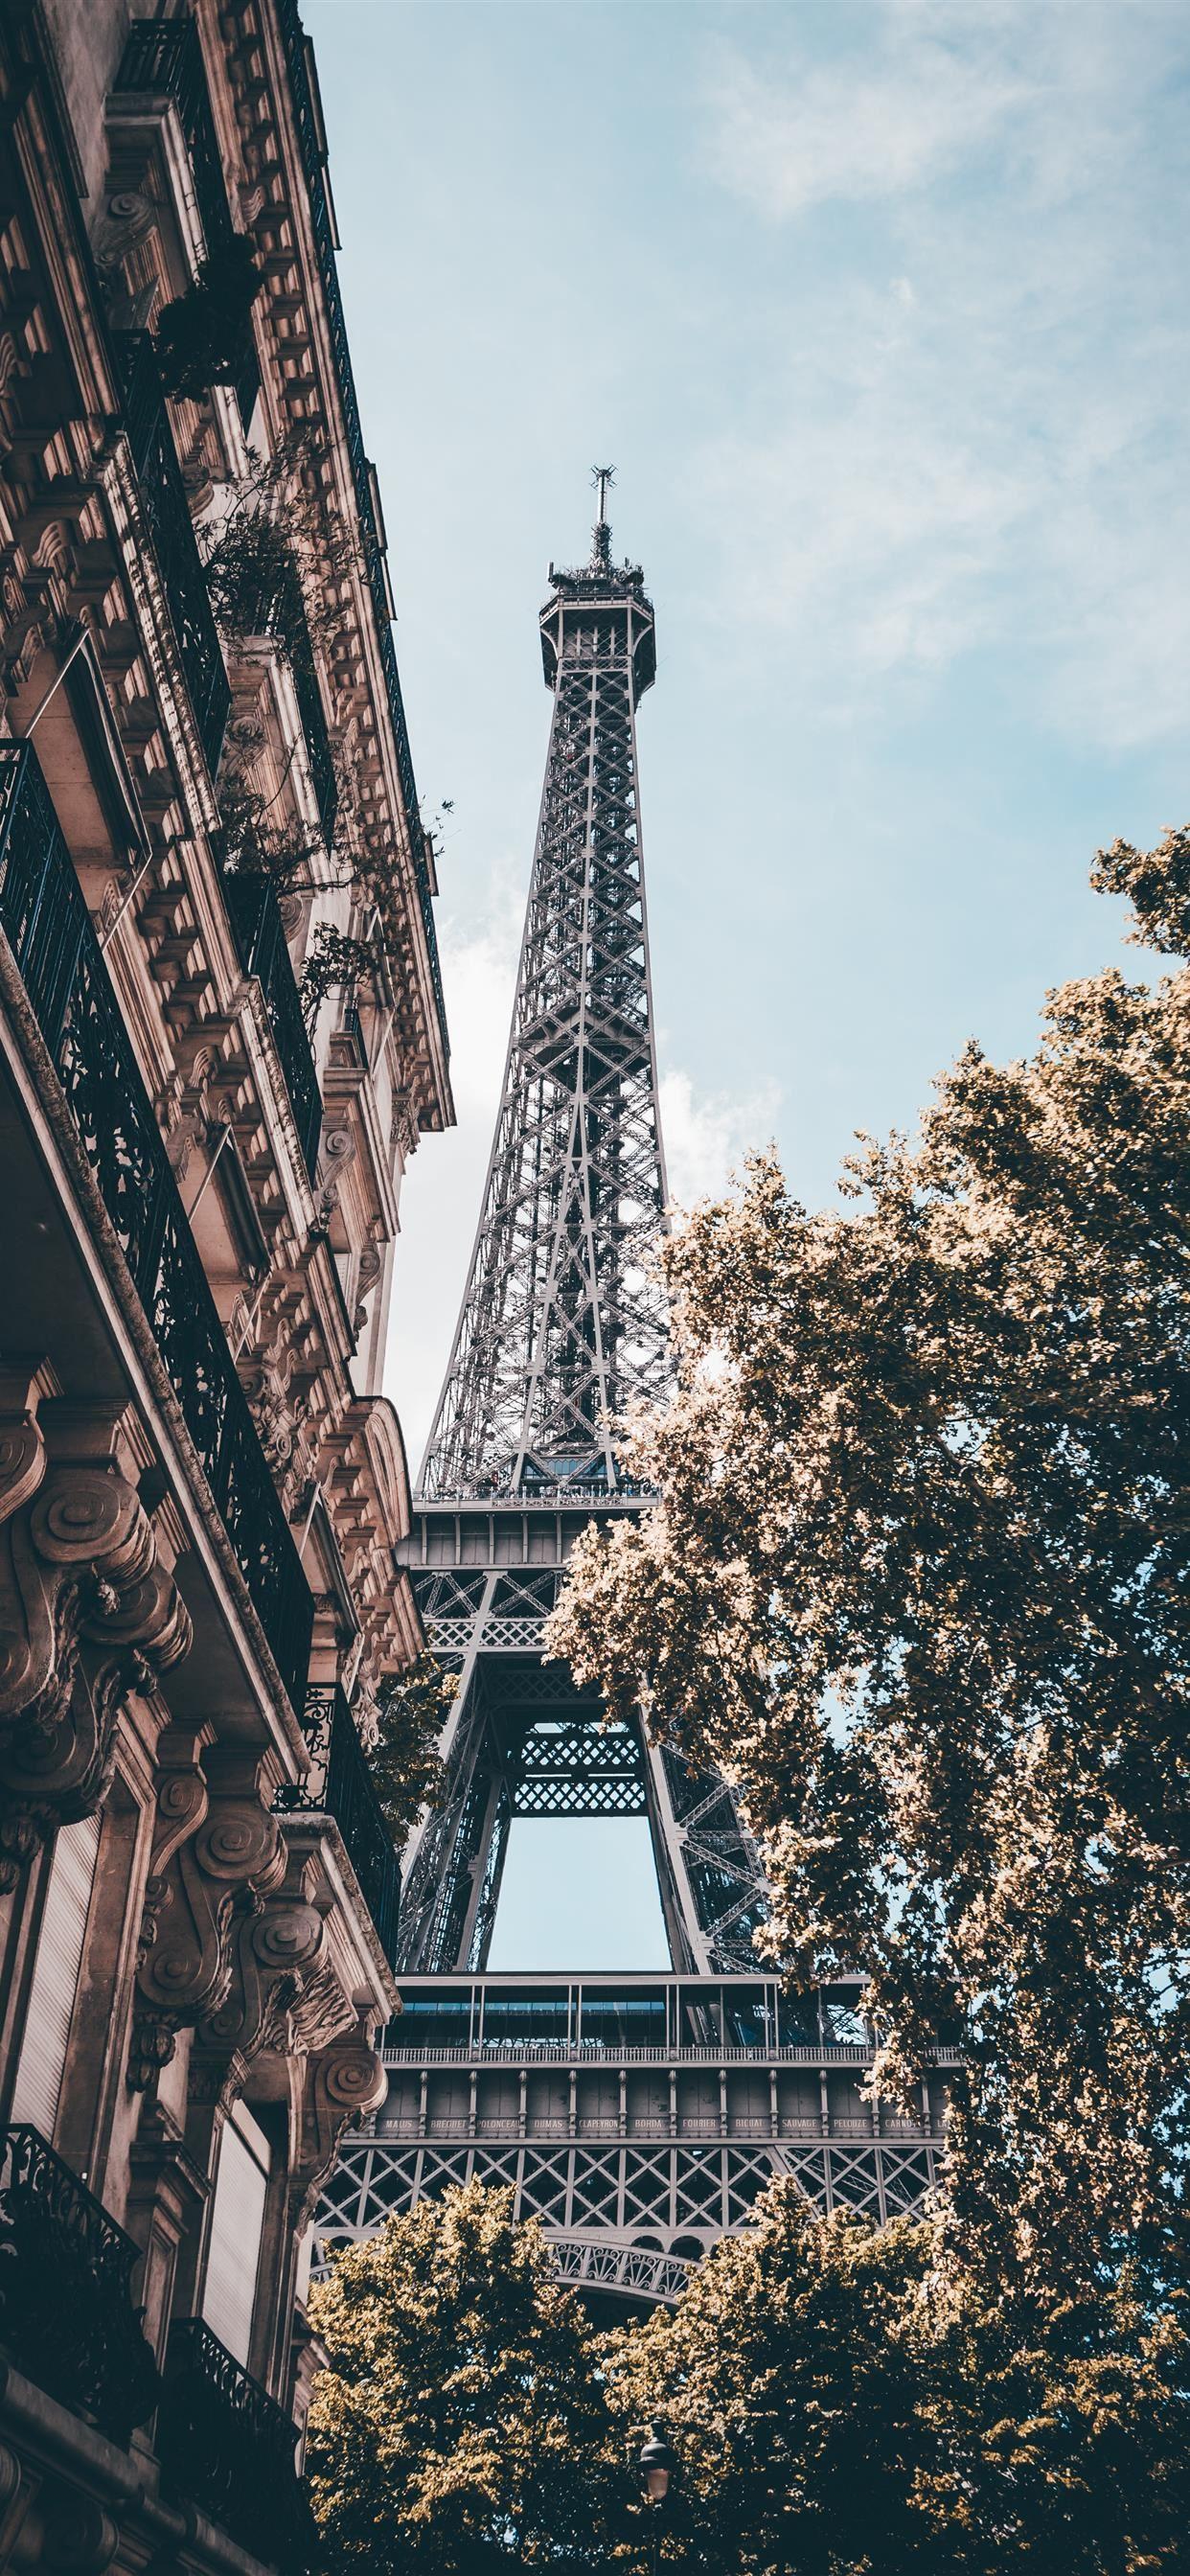 ... Day In Paris IPhone X Wallpaper.